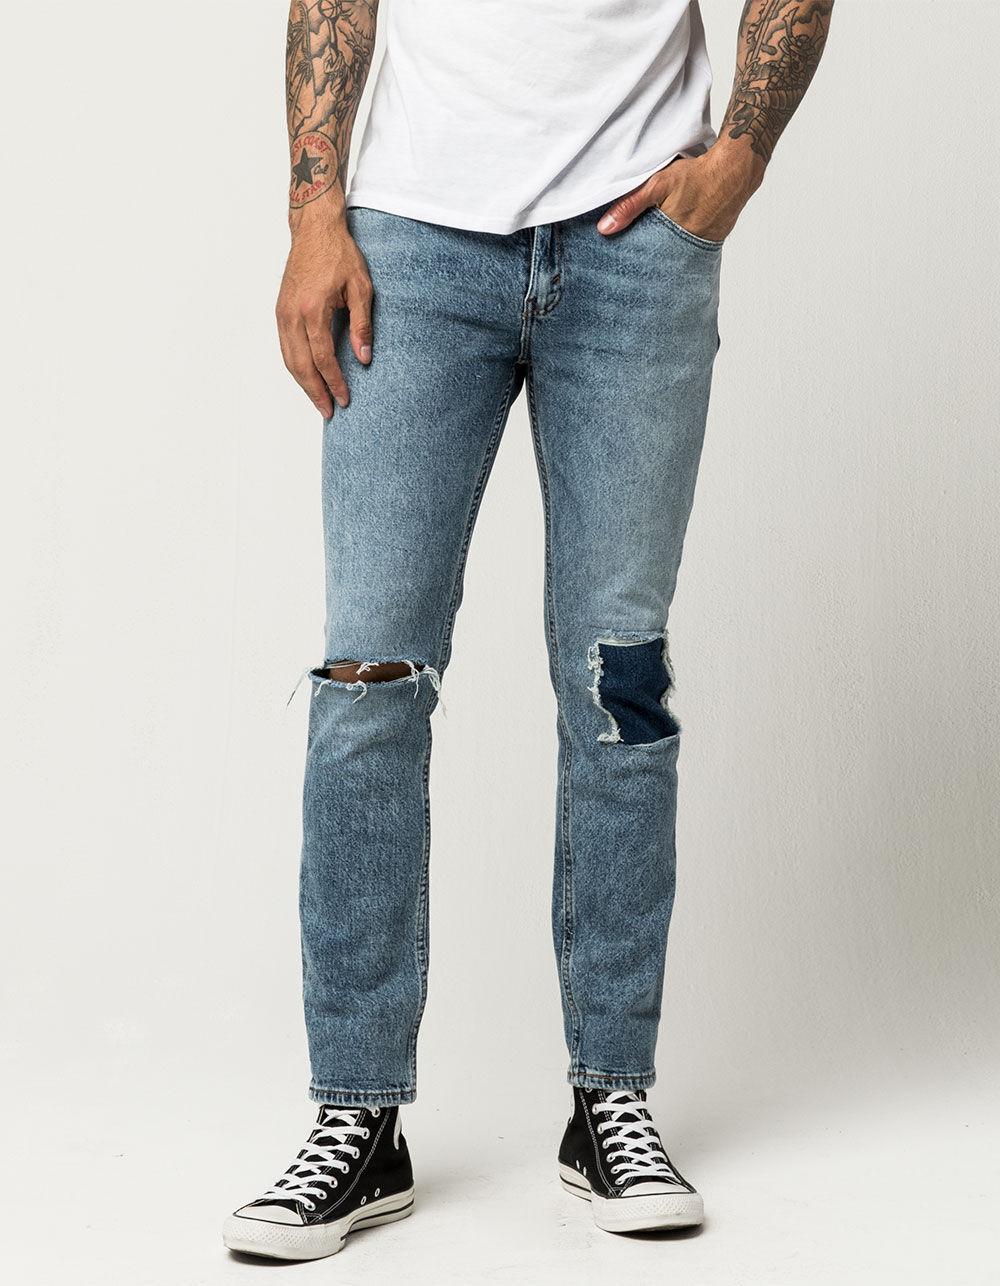 LEVI'S 511 Slim Ripped Jeans